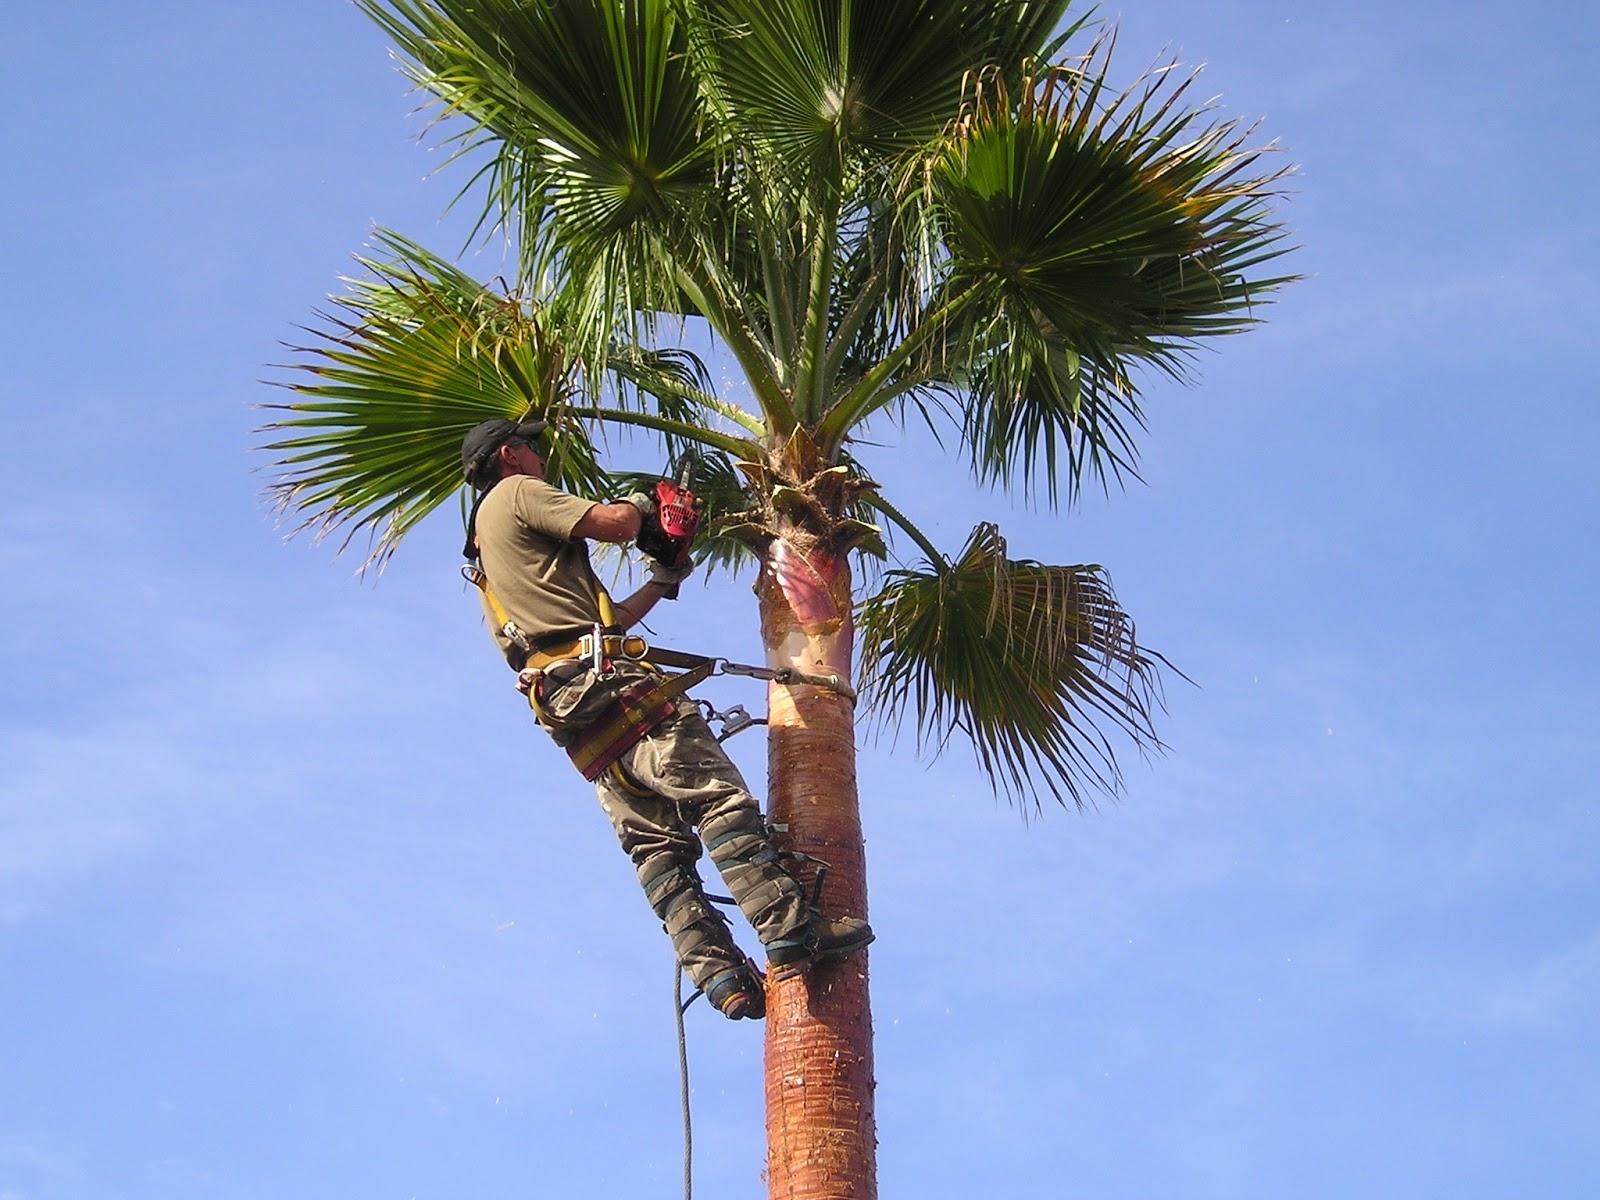 palmier washingtonia taille